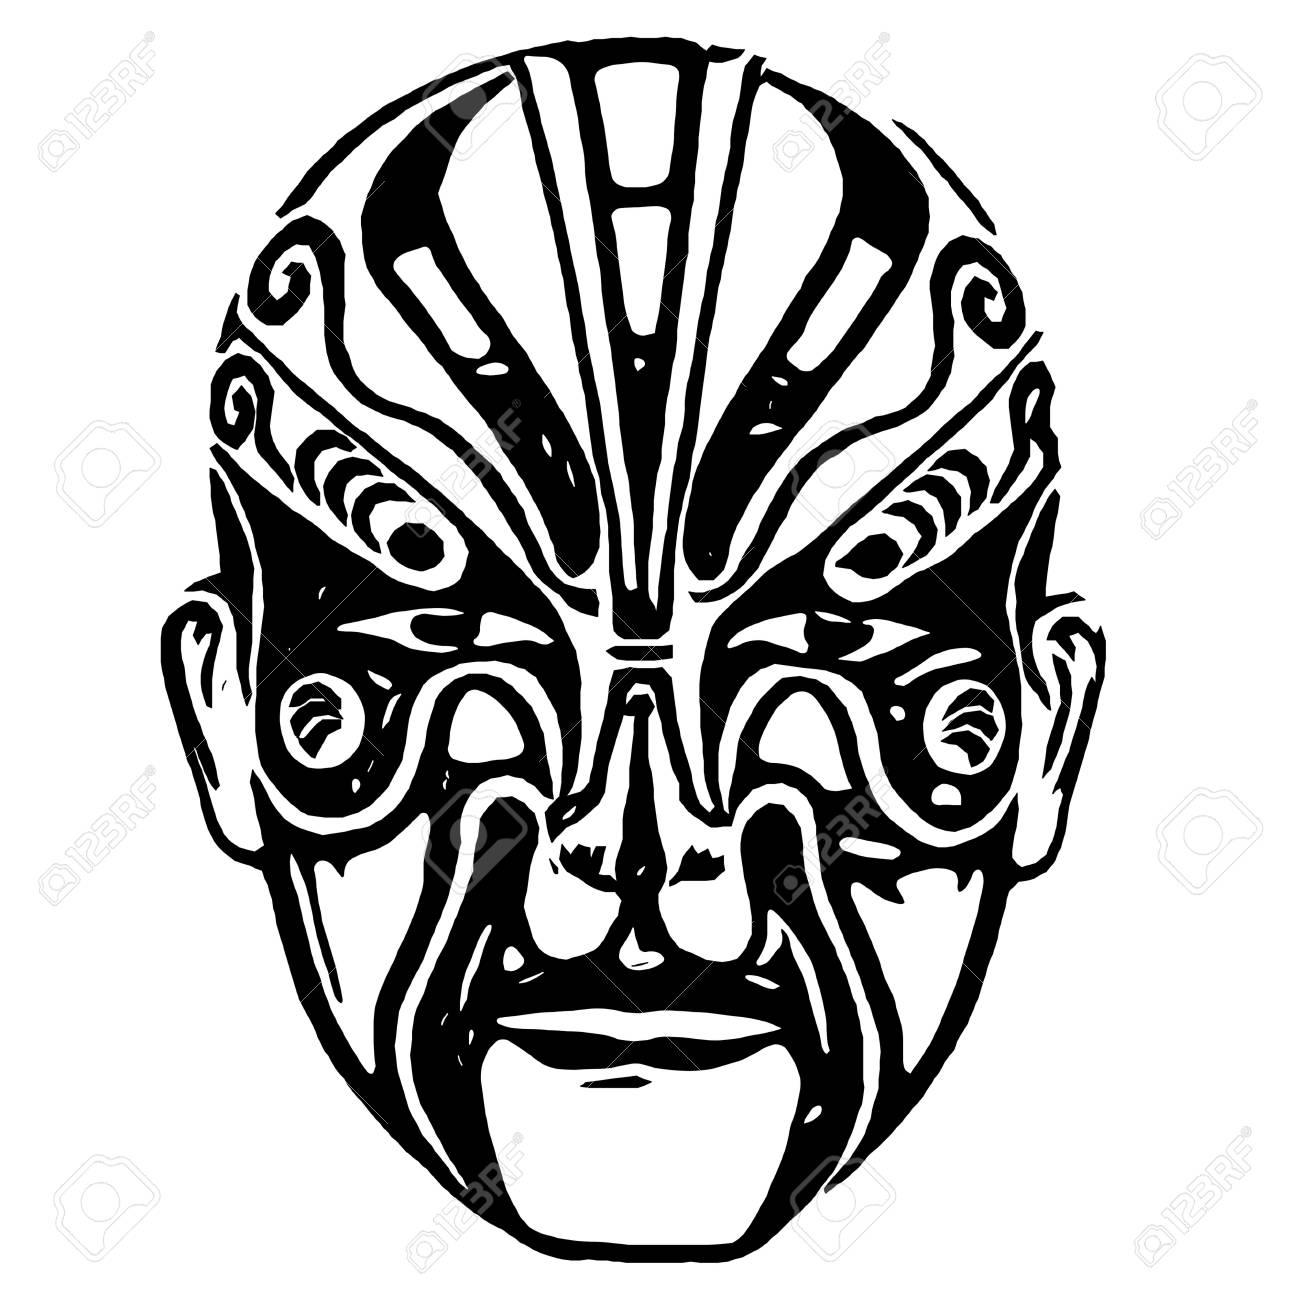 Chinese Mask Isolated On White Background By Illustration Stock